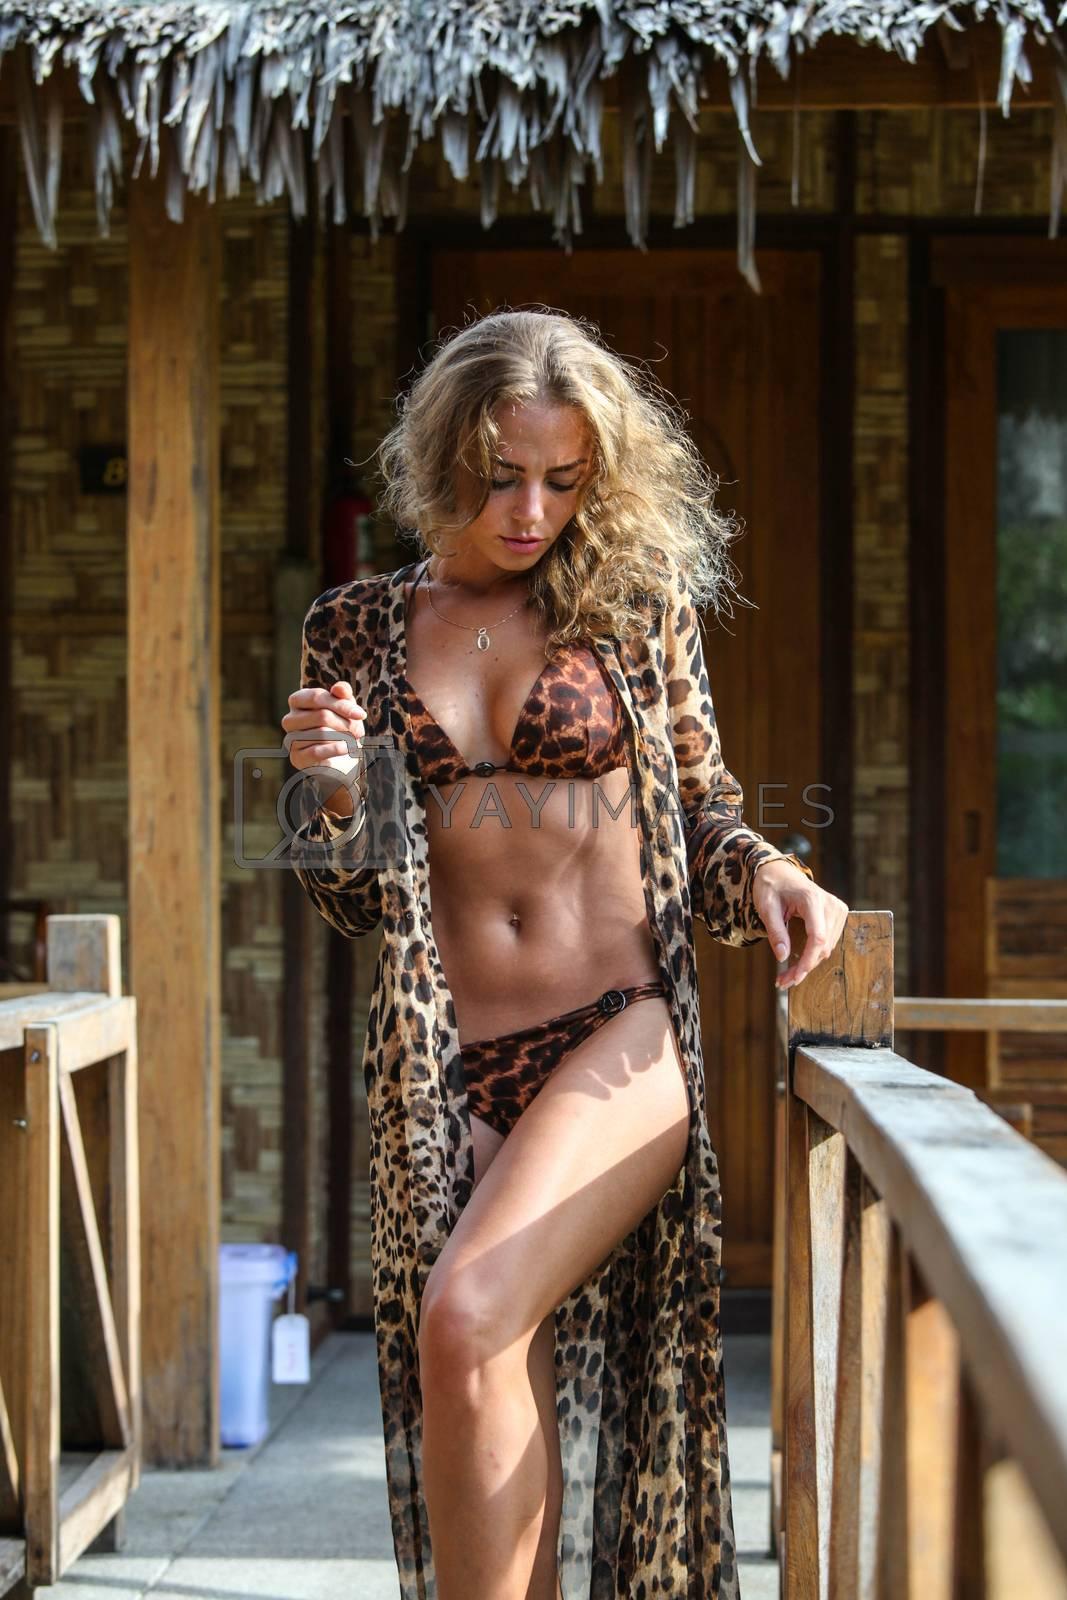 Stylish fashionable woman posing near house in tropical resort